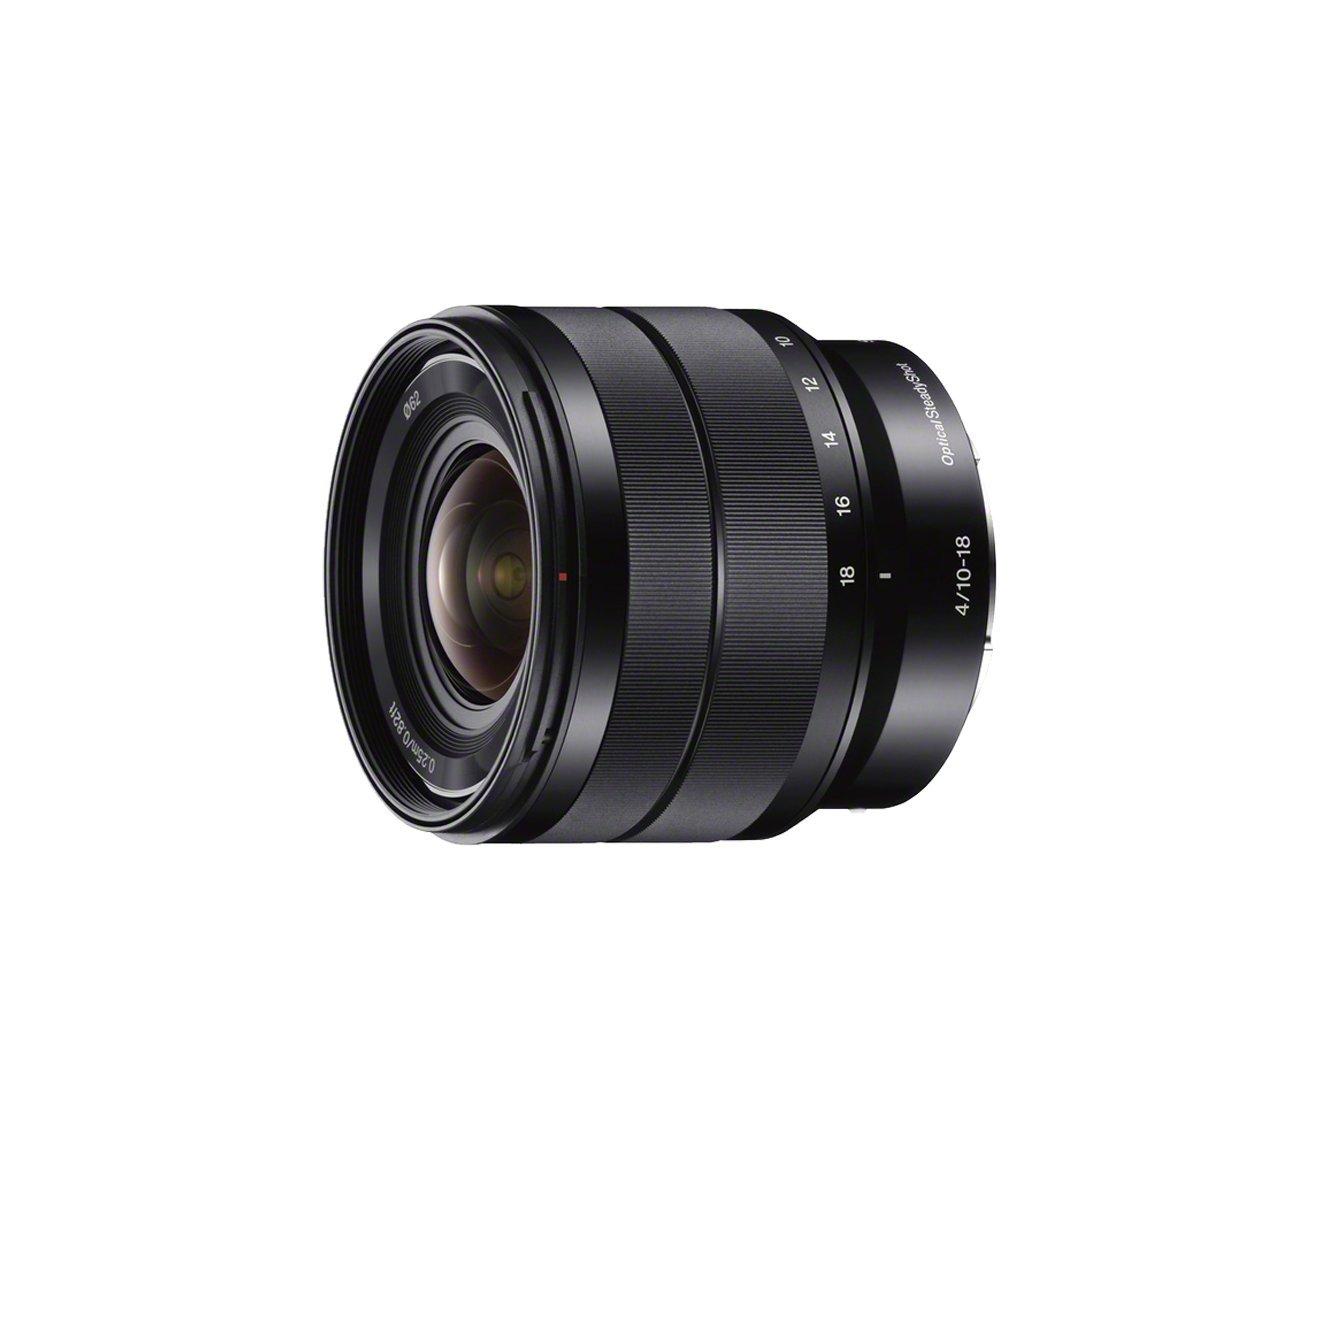 Sony SEL AE Objetivo para Sony Minolta distancia focal mm apertura f